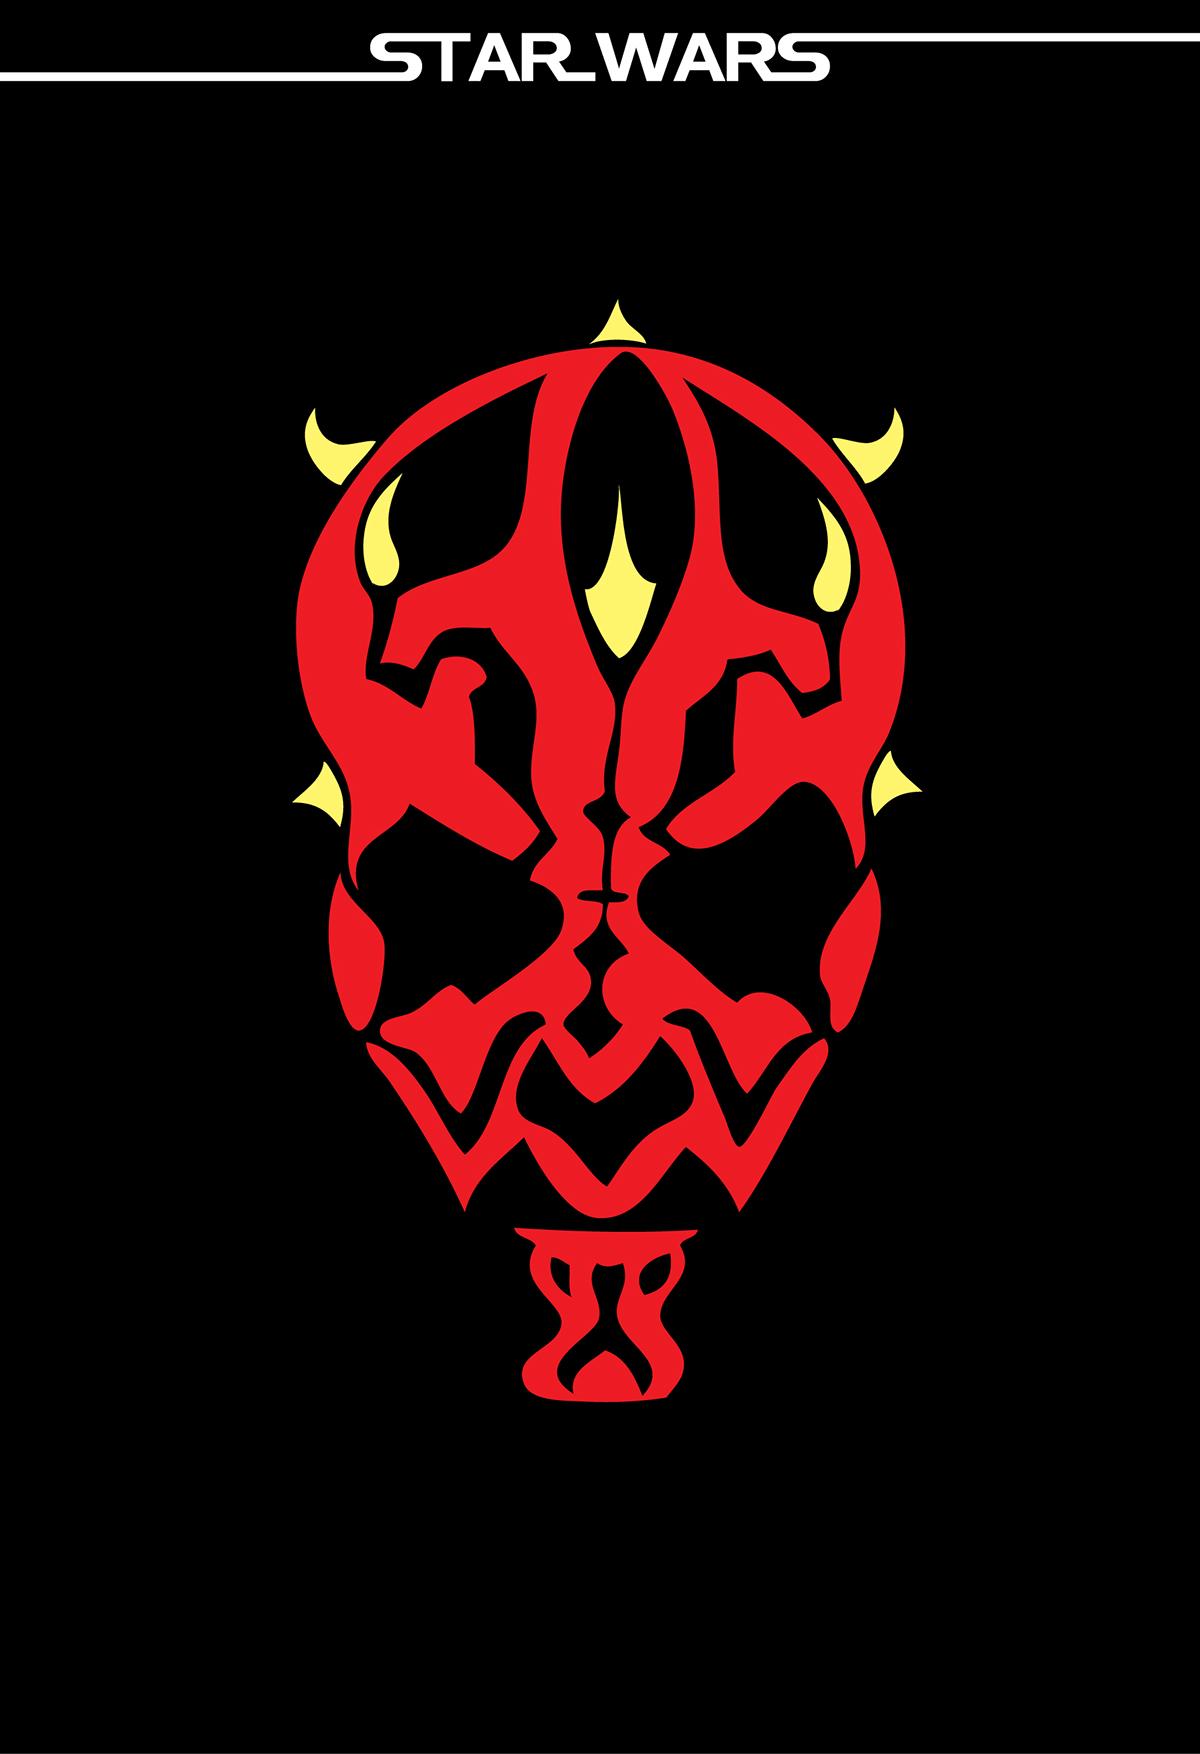 darth vader helmet silhouette